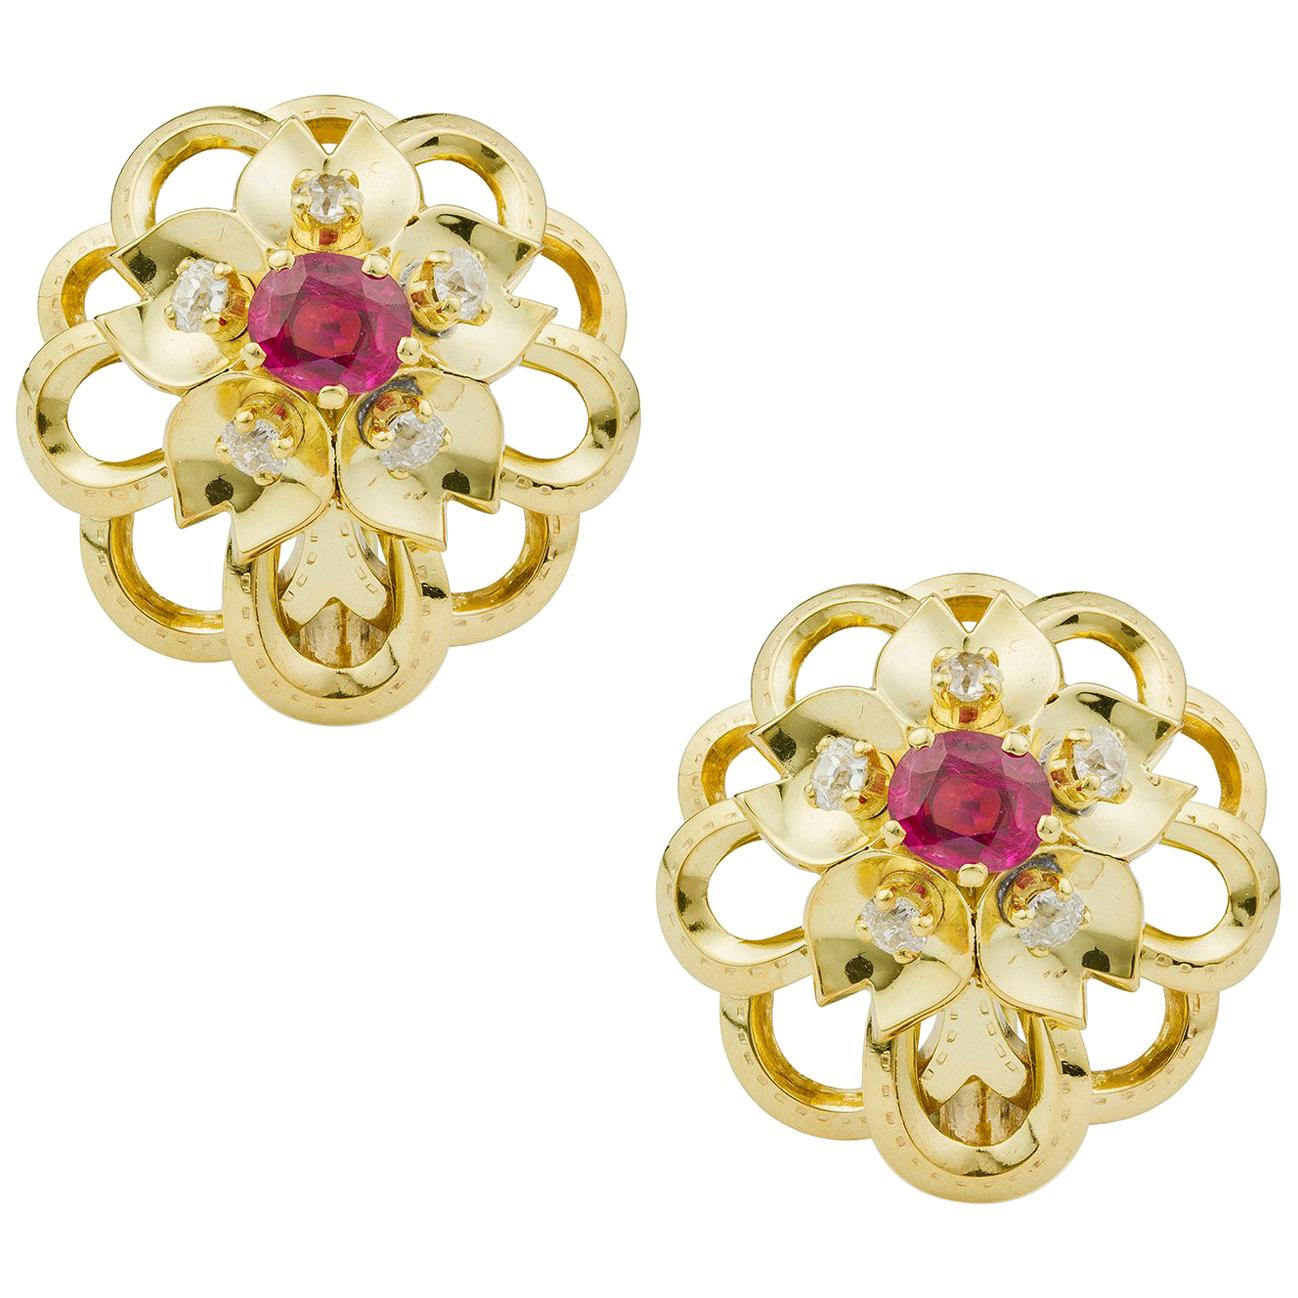 Cartier Ruby and Diamond Flower Earrings